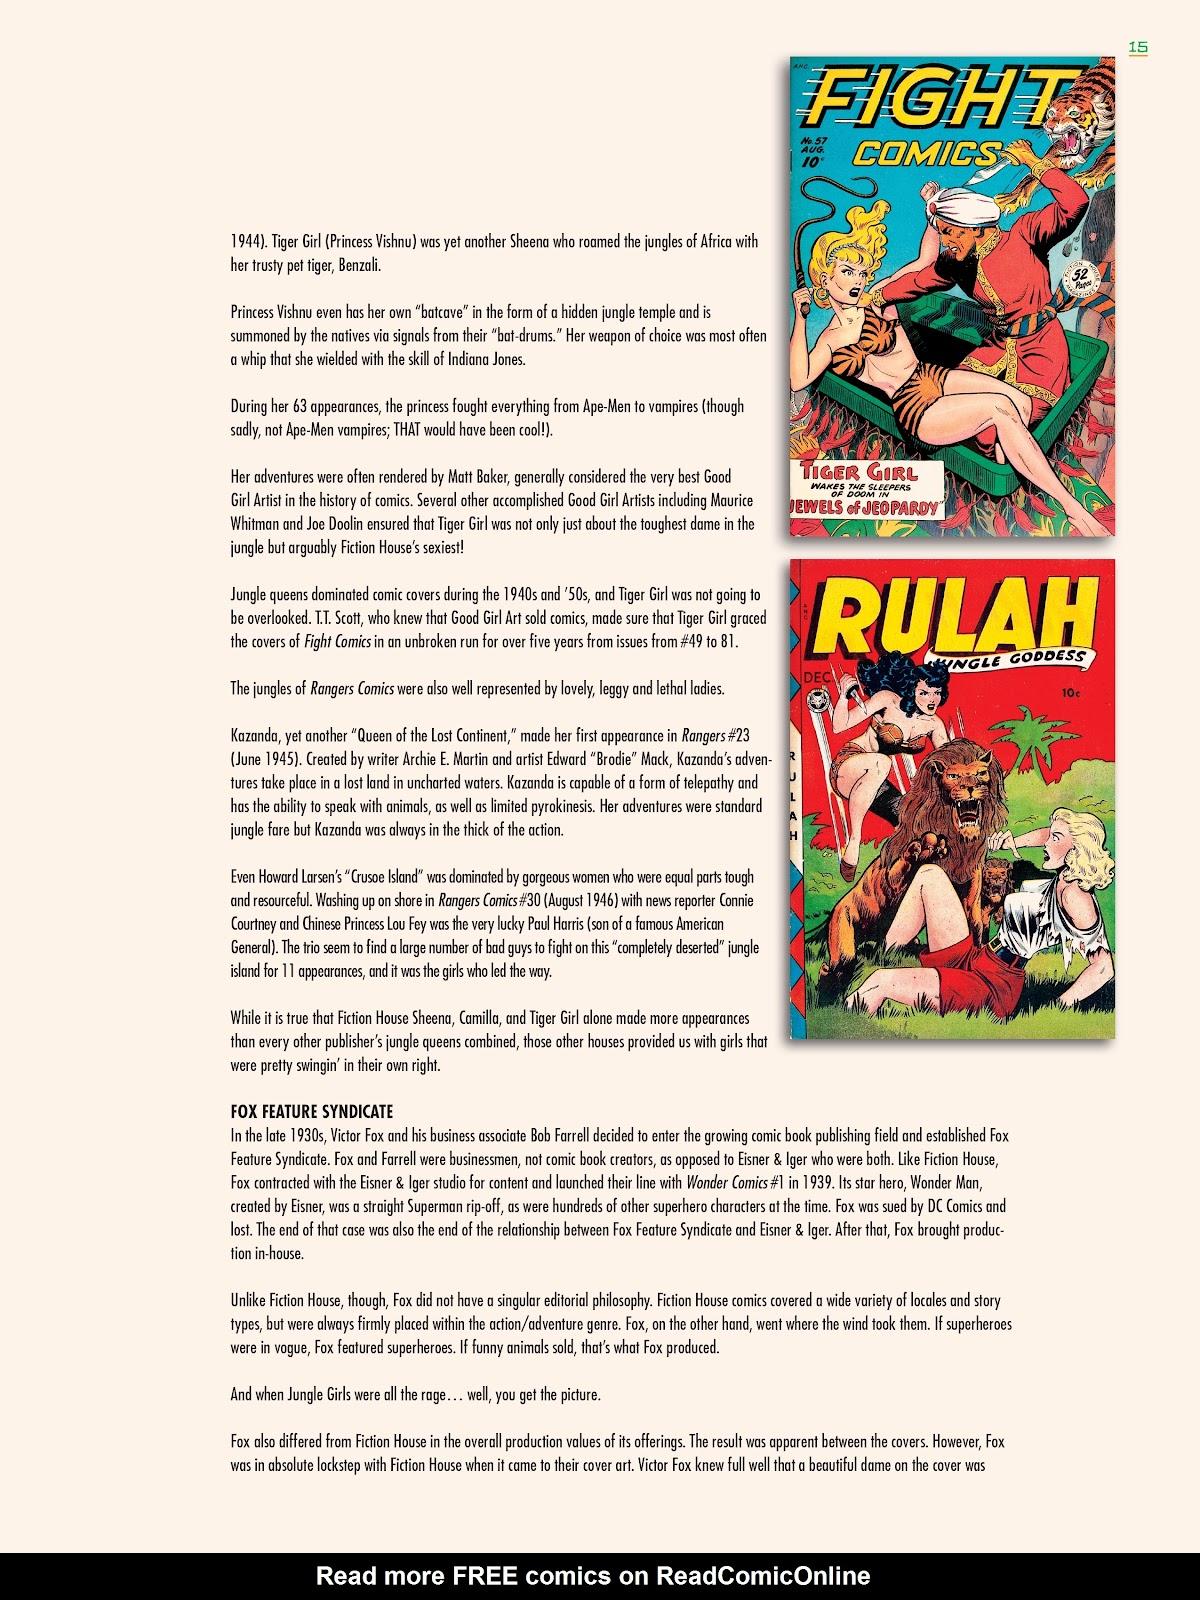 Read online Jungle Girls comic -  Issue # TPB (Part 1) - 17